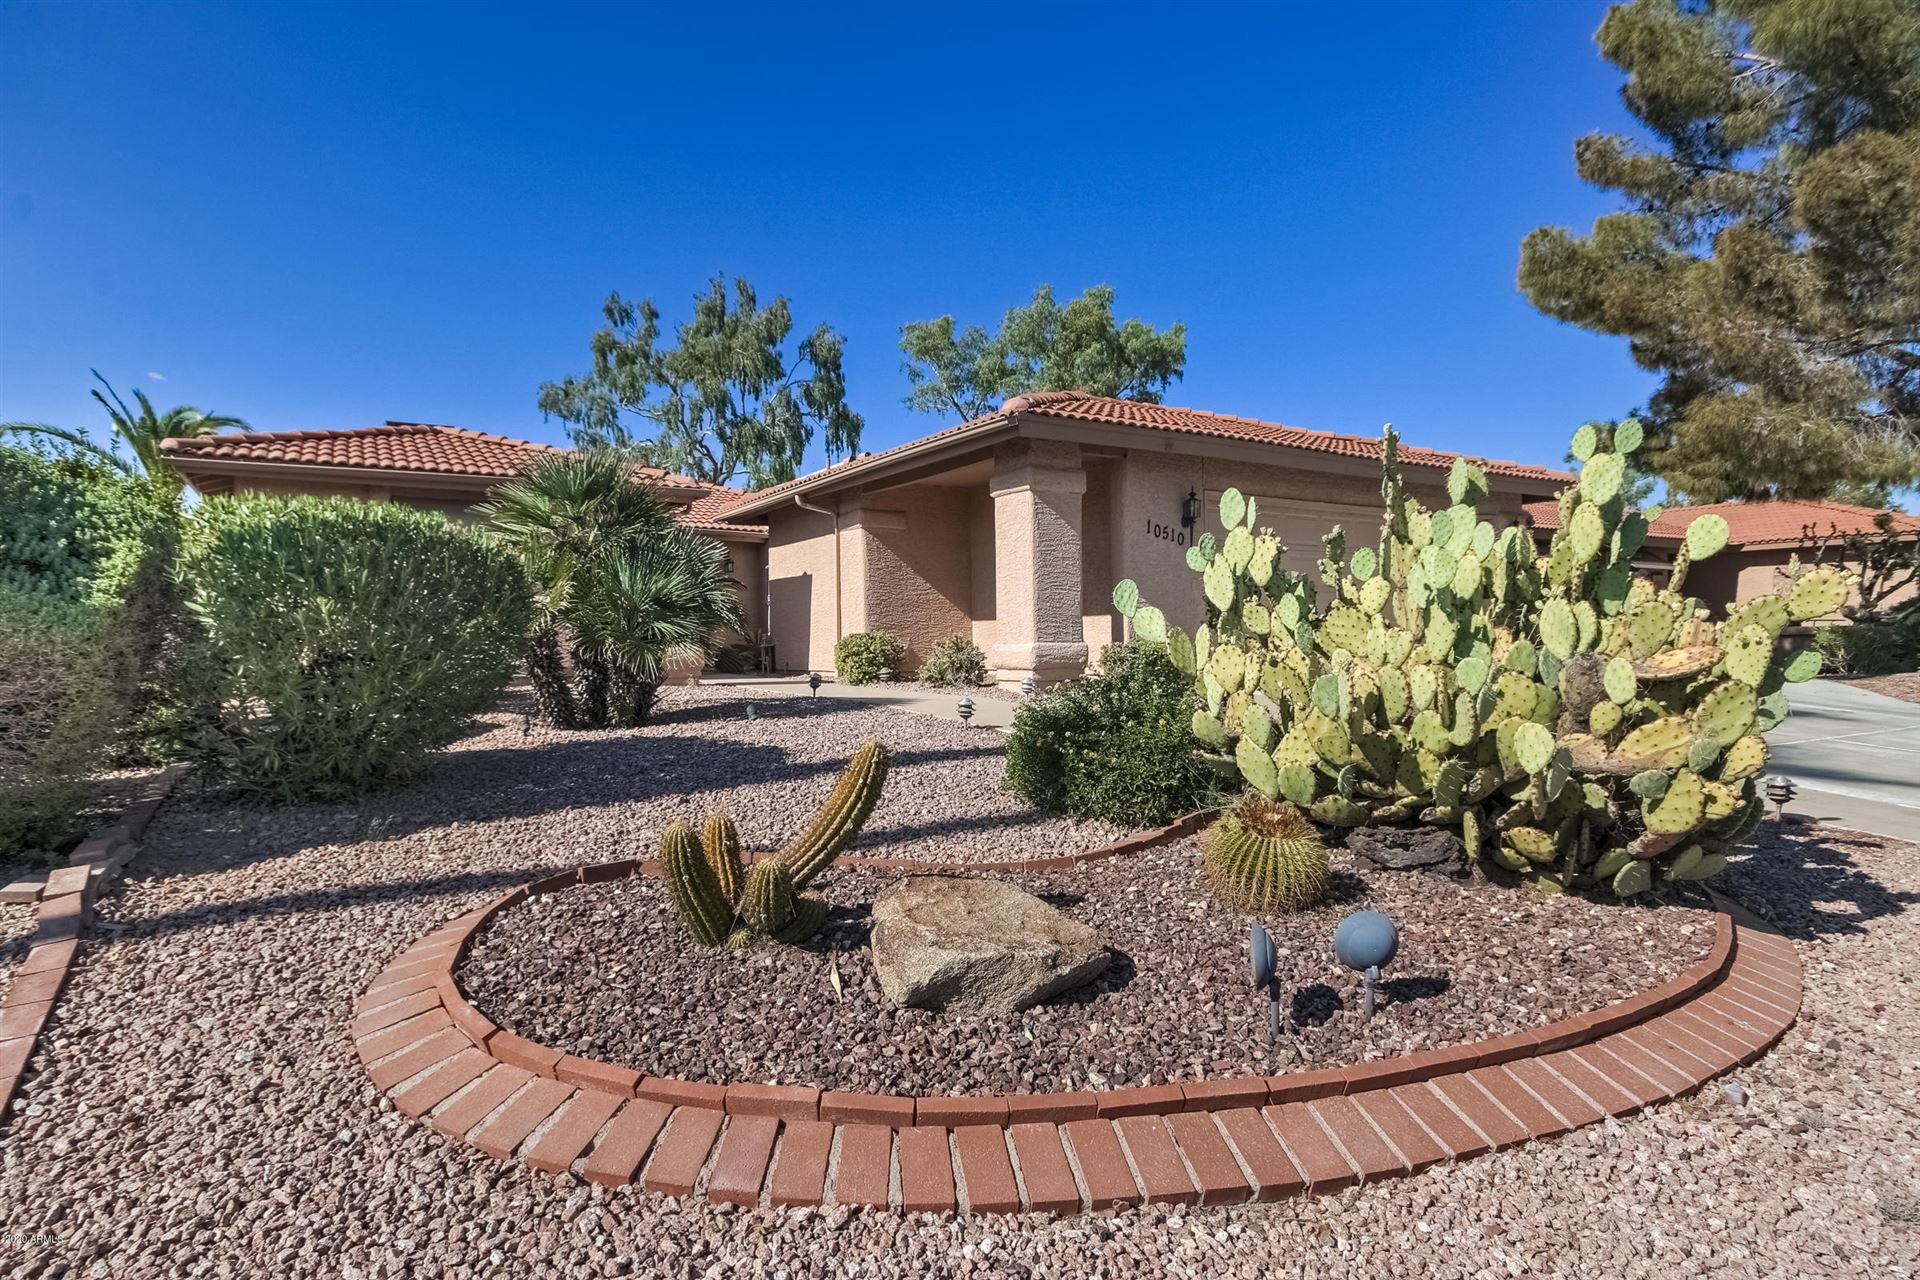 10510 E SPRING CREEK Road #21, Sun Lakes, AZ 85248 - MLS#: 6108306